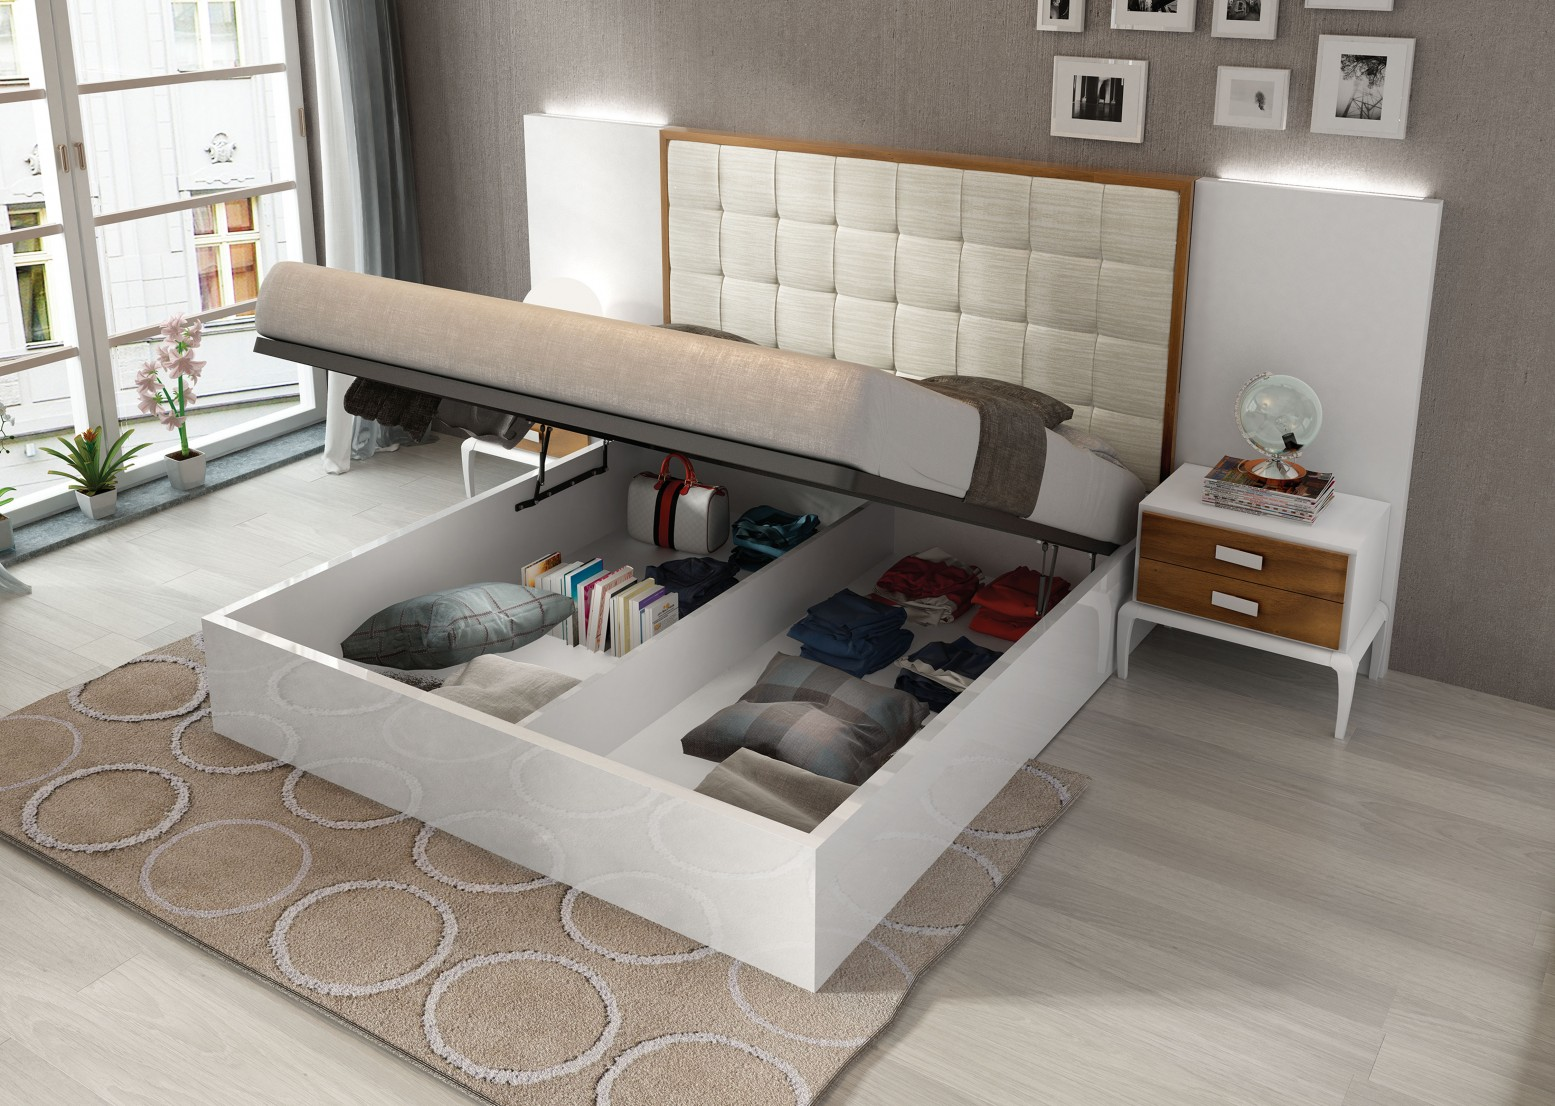 Malaga King Size Storage Bedroom Set